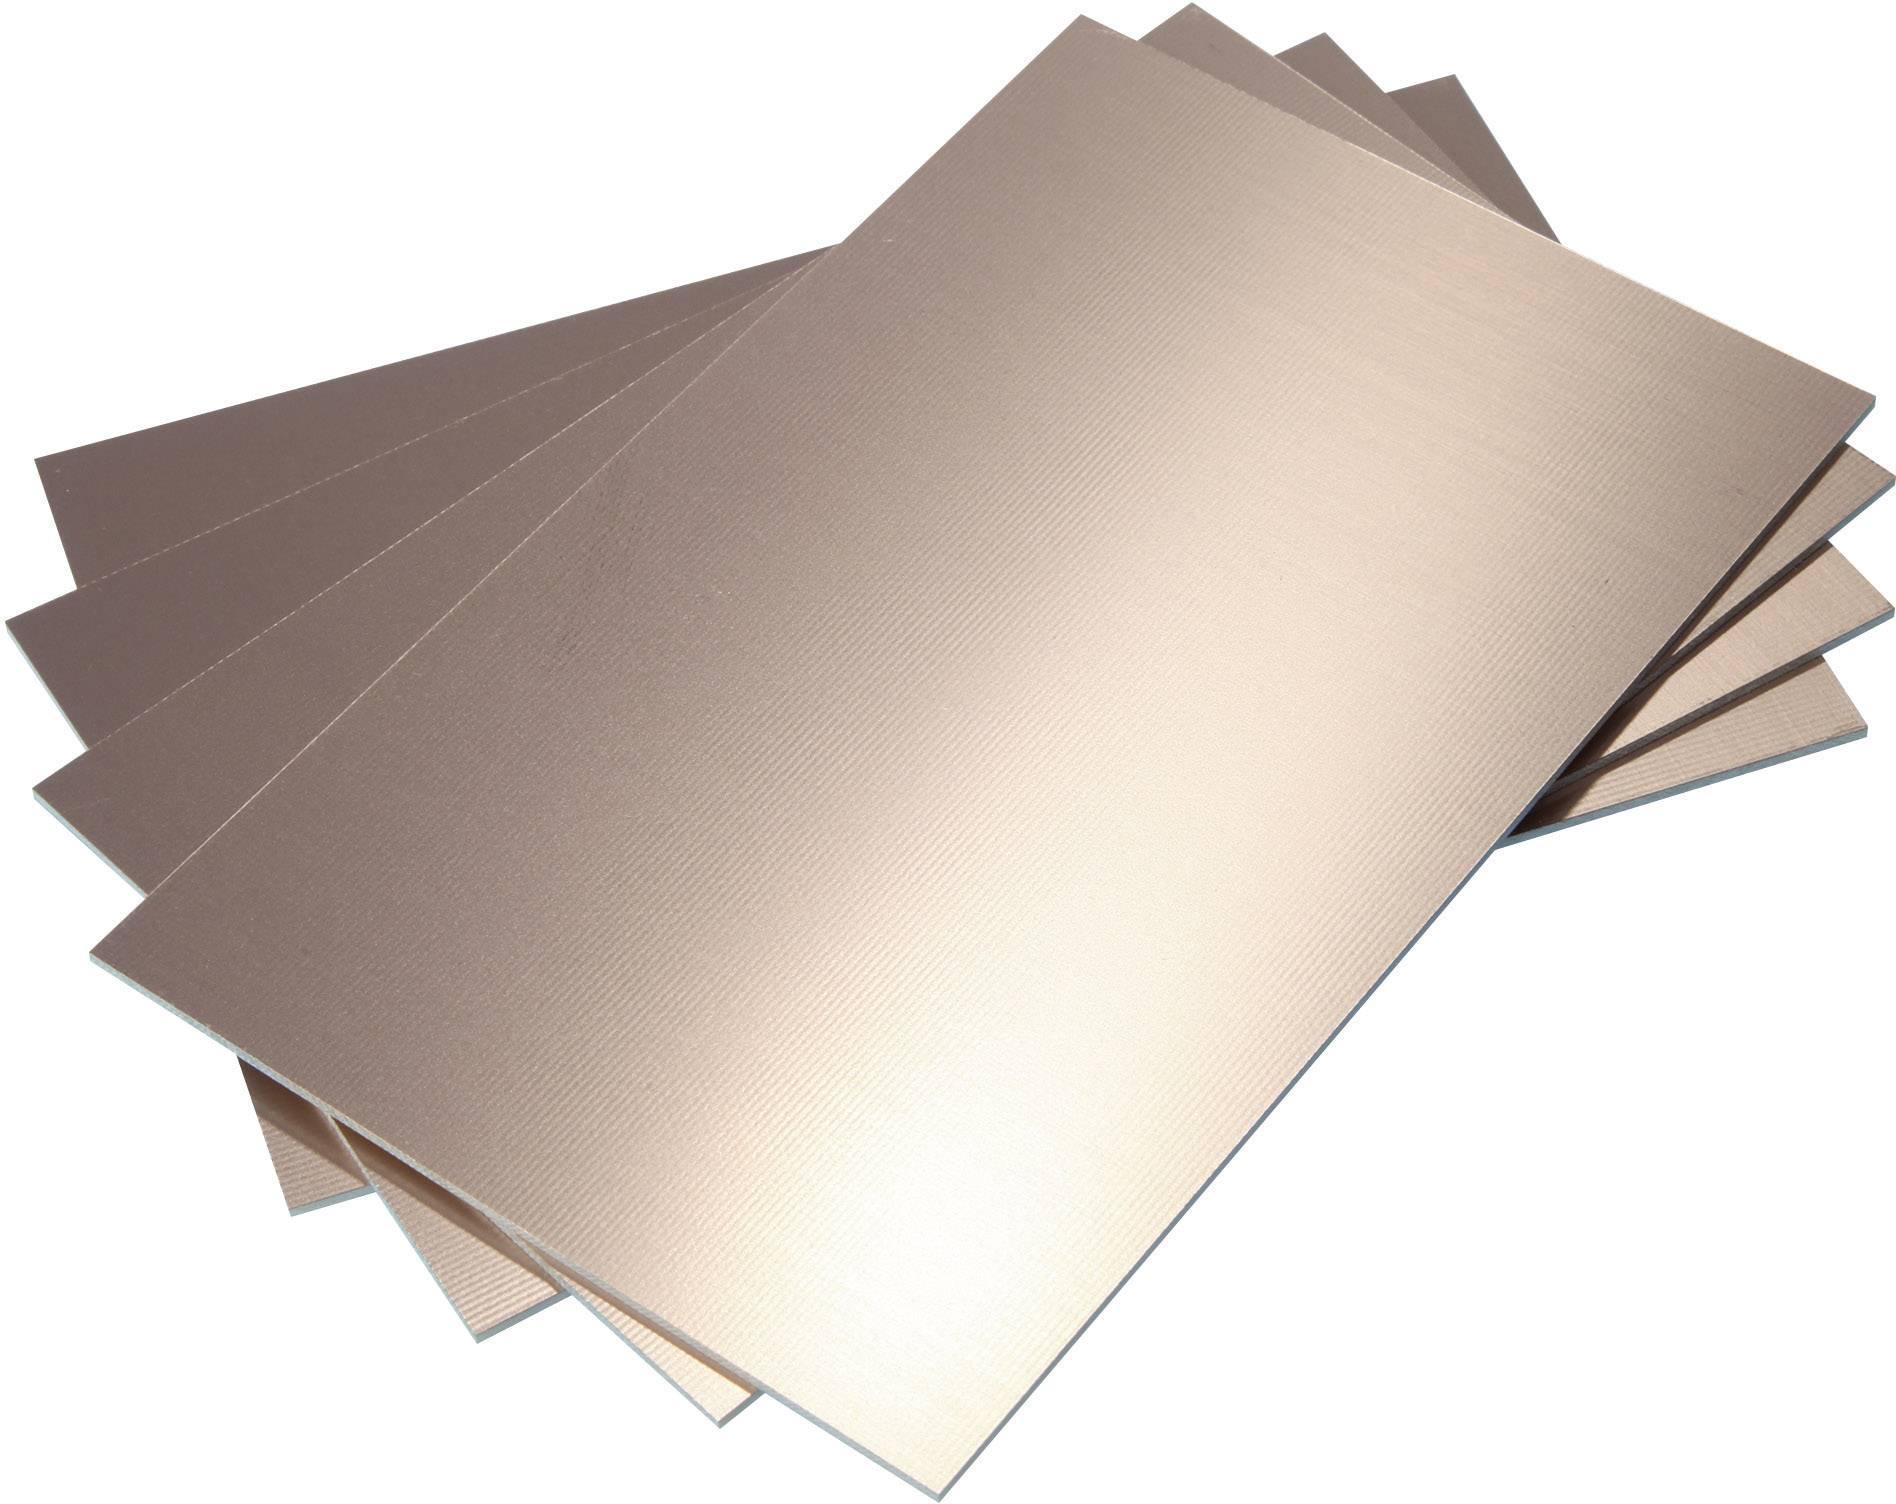 Základný materiál DPS Bungard 020306Z33-50, 35 µm, (d x š) 160 mm x 100 mm